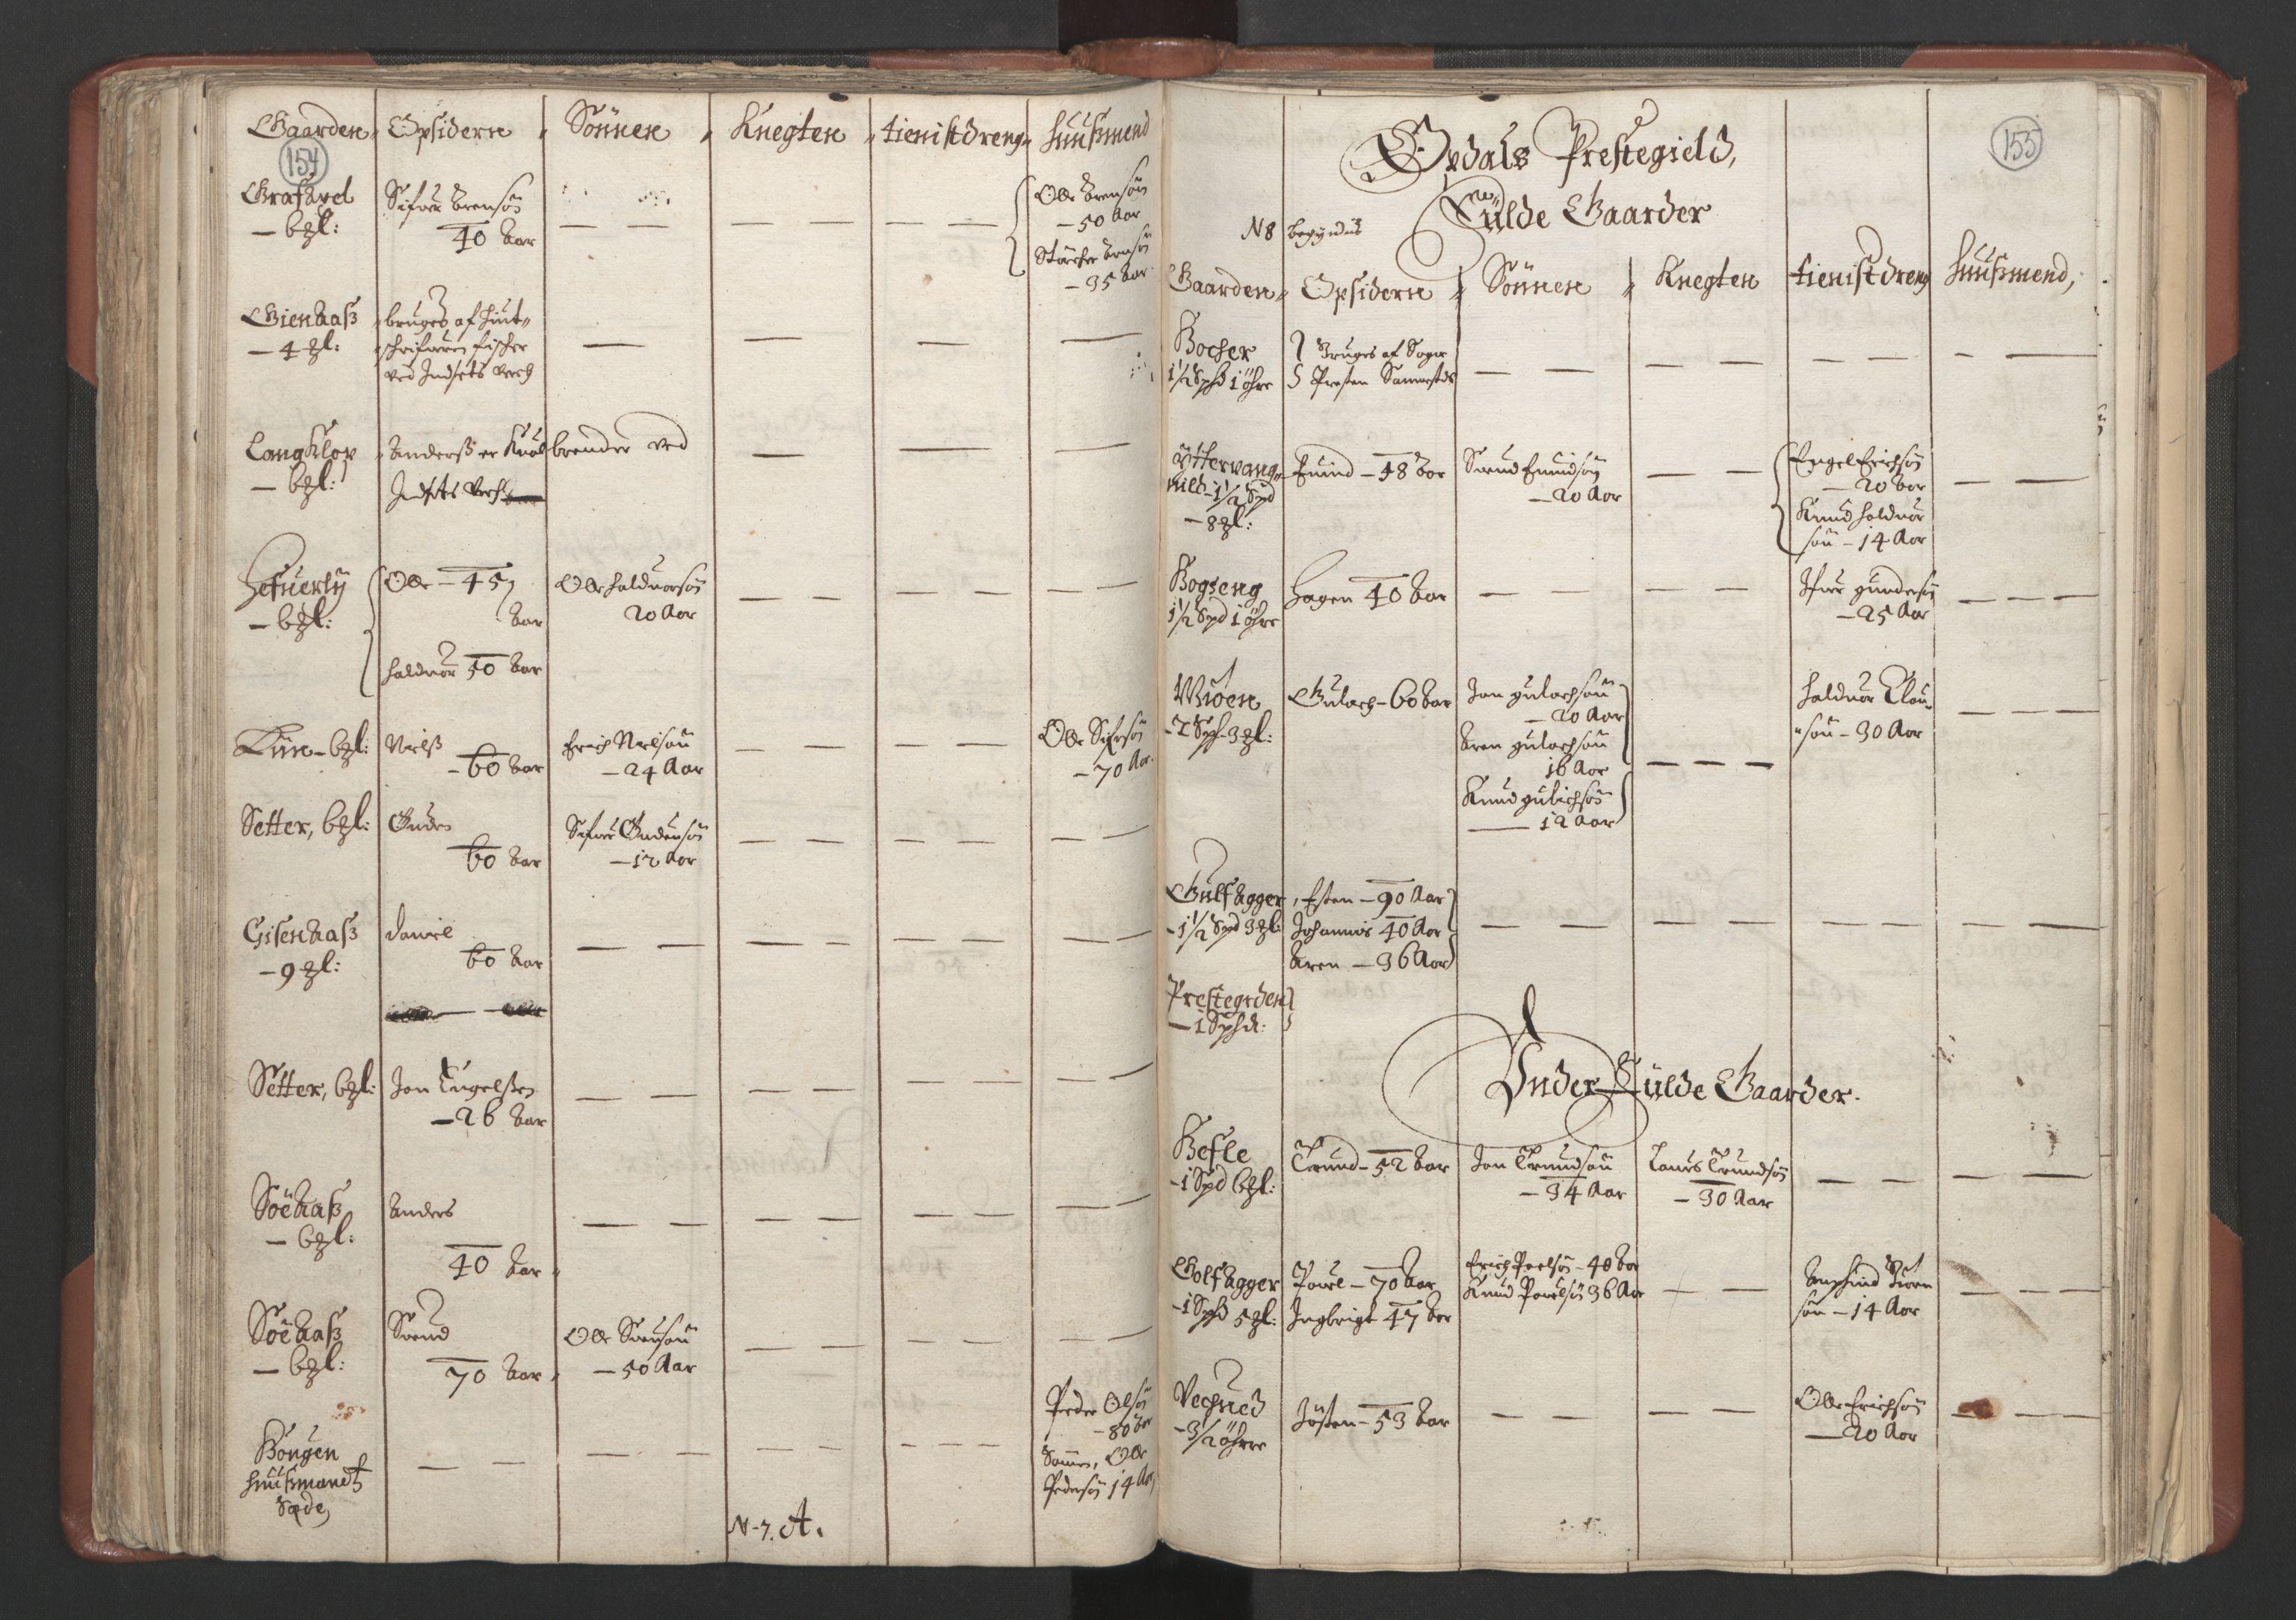 RA, Fogdenes og sorenskrivernes manntall 1664-1666, nr. 18: Gauldal fogderi, Strinda fogderi og Orkdal fogderi, 1664, s. 154-155